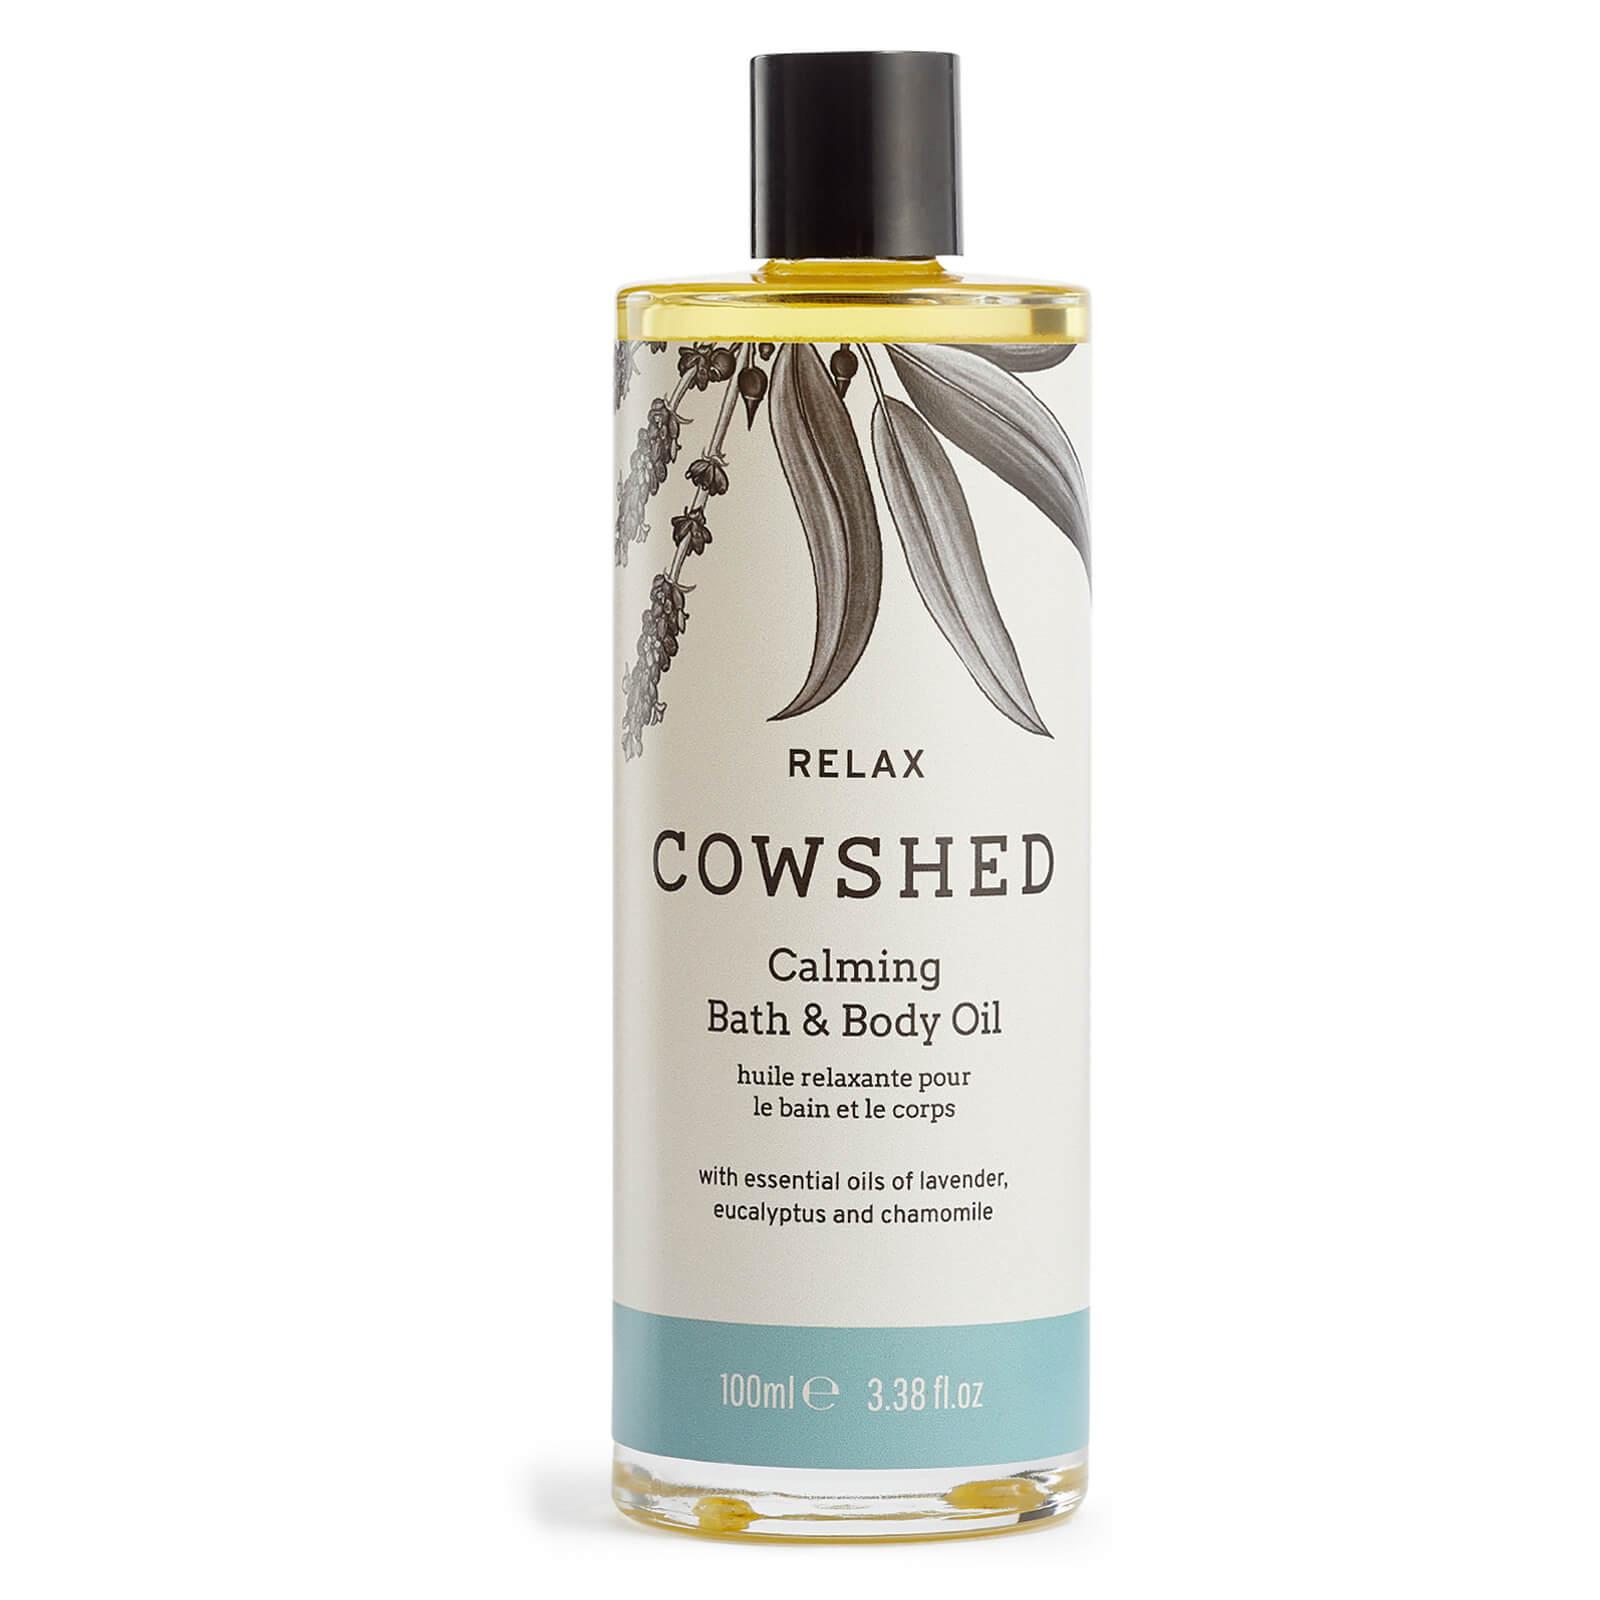 Купить Cowshed RELAX Calming Bath & Body Oil 100ml